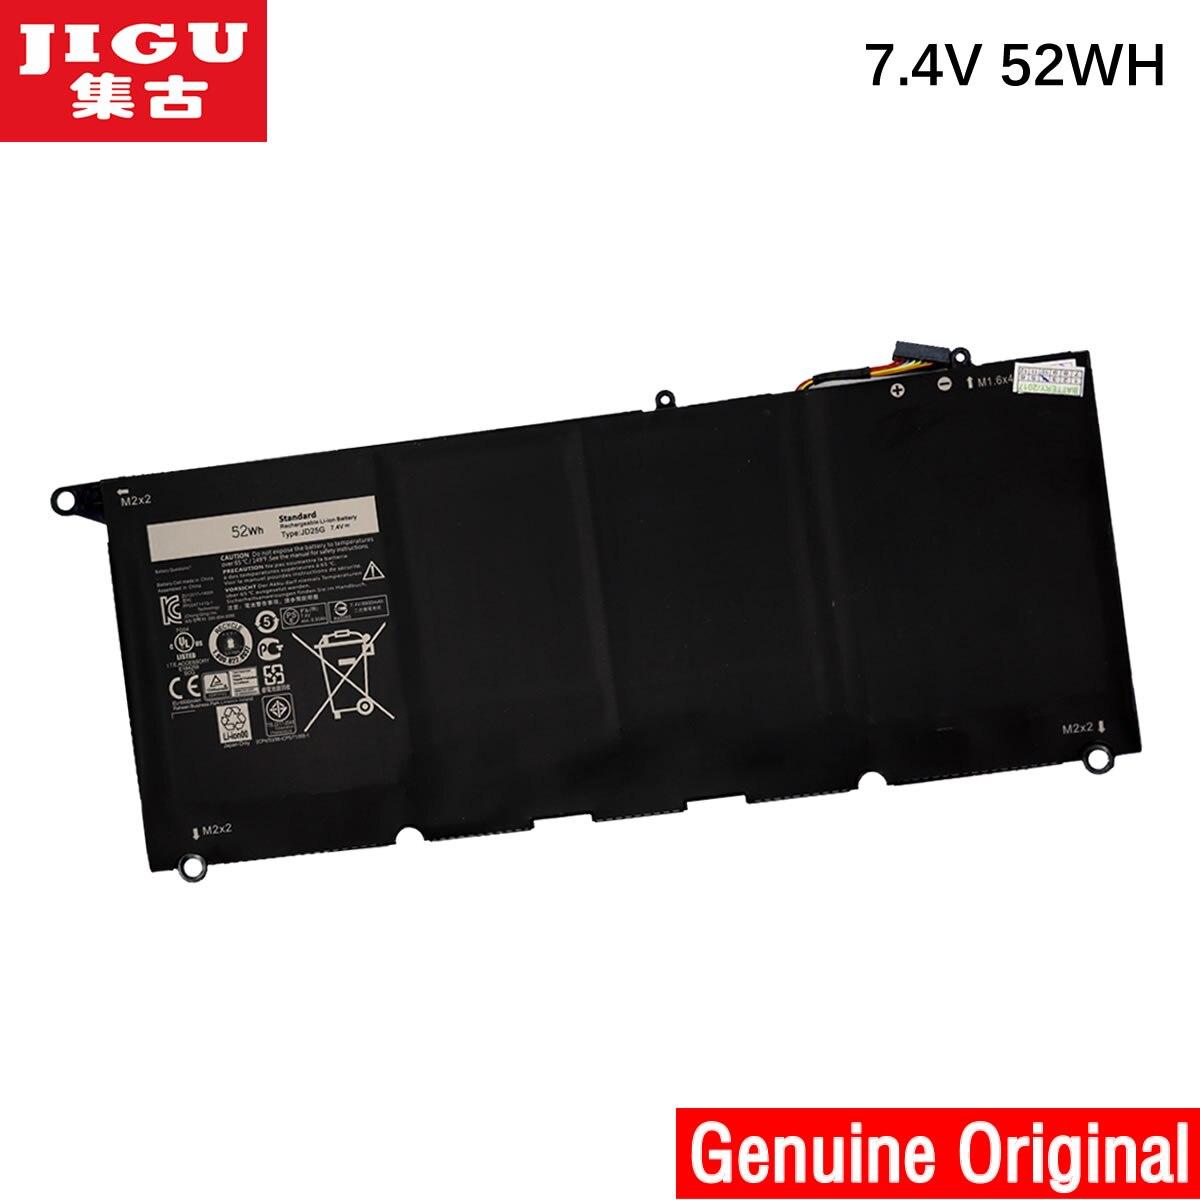 JIGU New Laptop Batteries For 0N7T6,RWT1R,JD25G,XPS 13-9350-D1609,90V7W,XPS 13D-9343,XPS 13-9350-D1808T,7.6V,8 CellJIGU New Laptop Batteries For 0N7T6,RWT1R,JD25G,XPS 13-9350-D1609,90V7W,XPS 13D-9343,XPS 13-9350-D1808T,7.6V,8 Cell